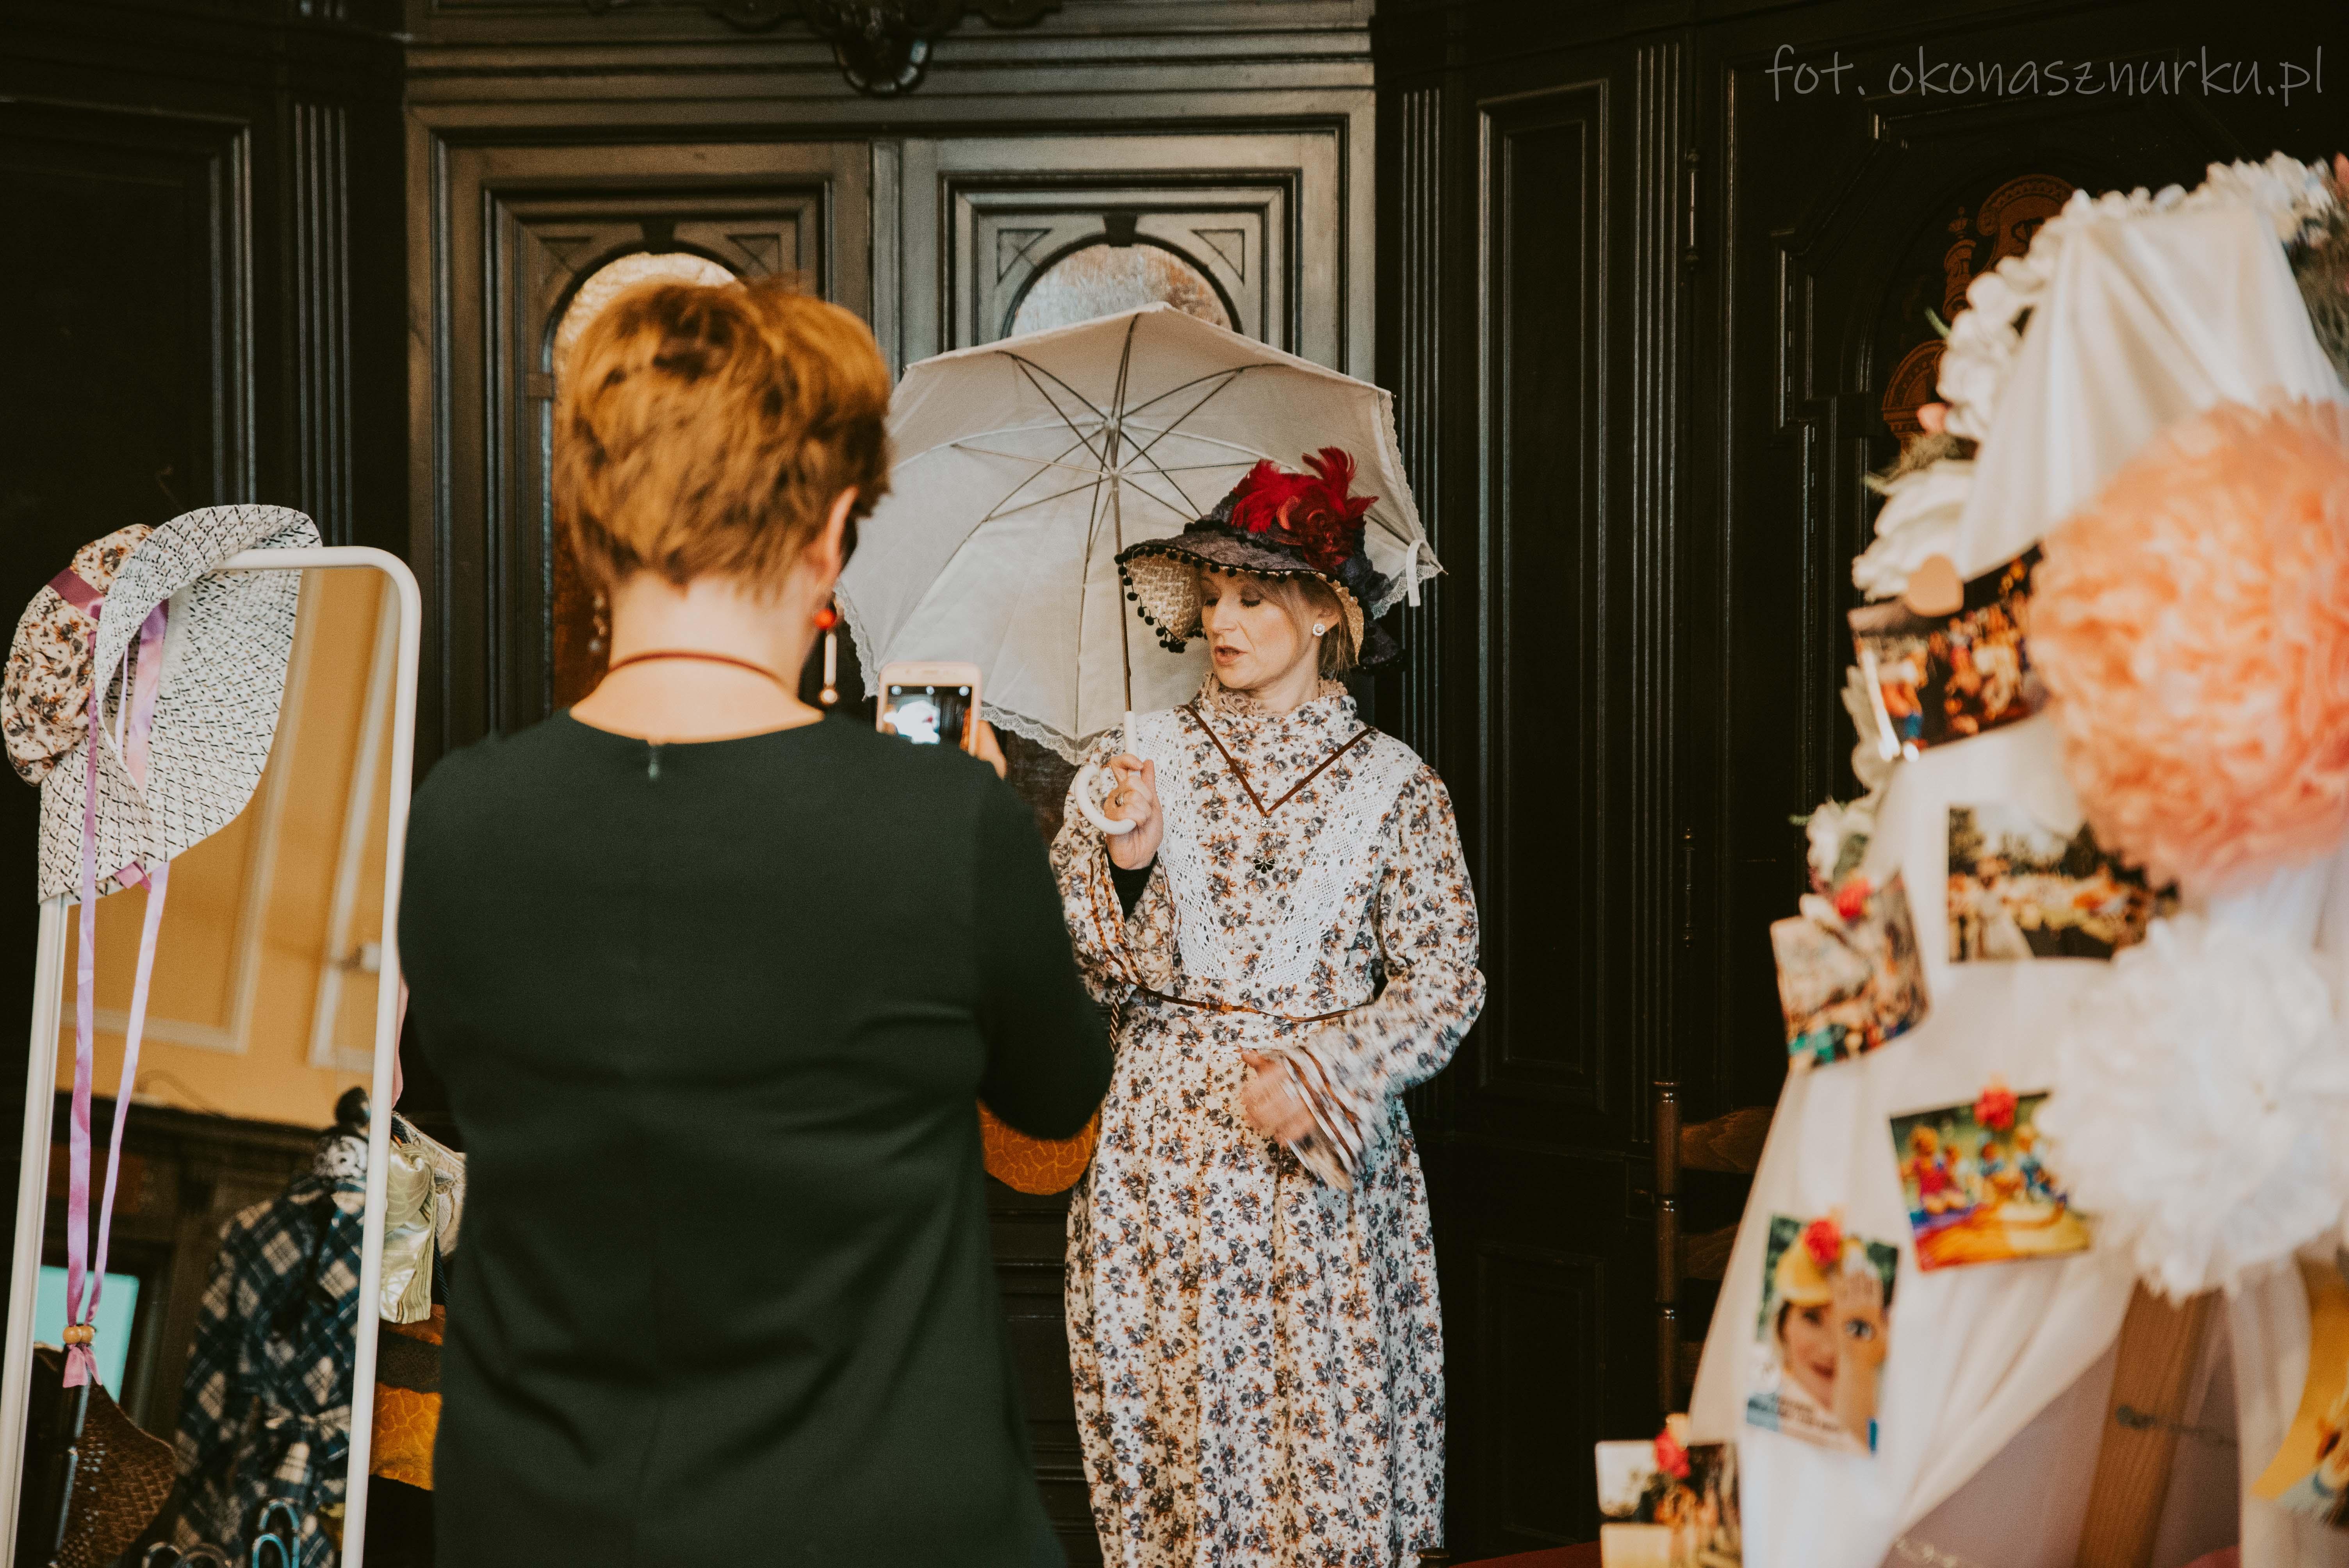 concept-weddings-okonasznurku-fotografia (6)